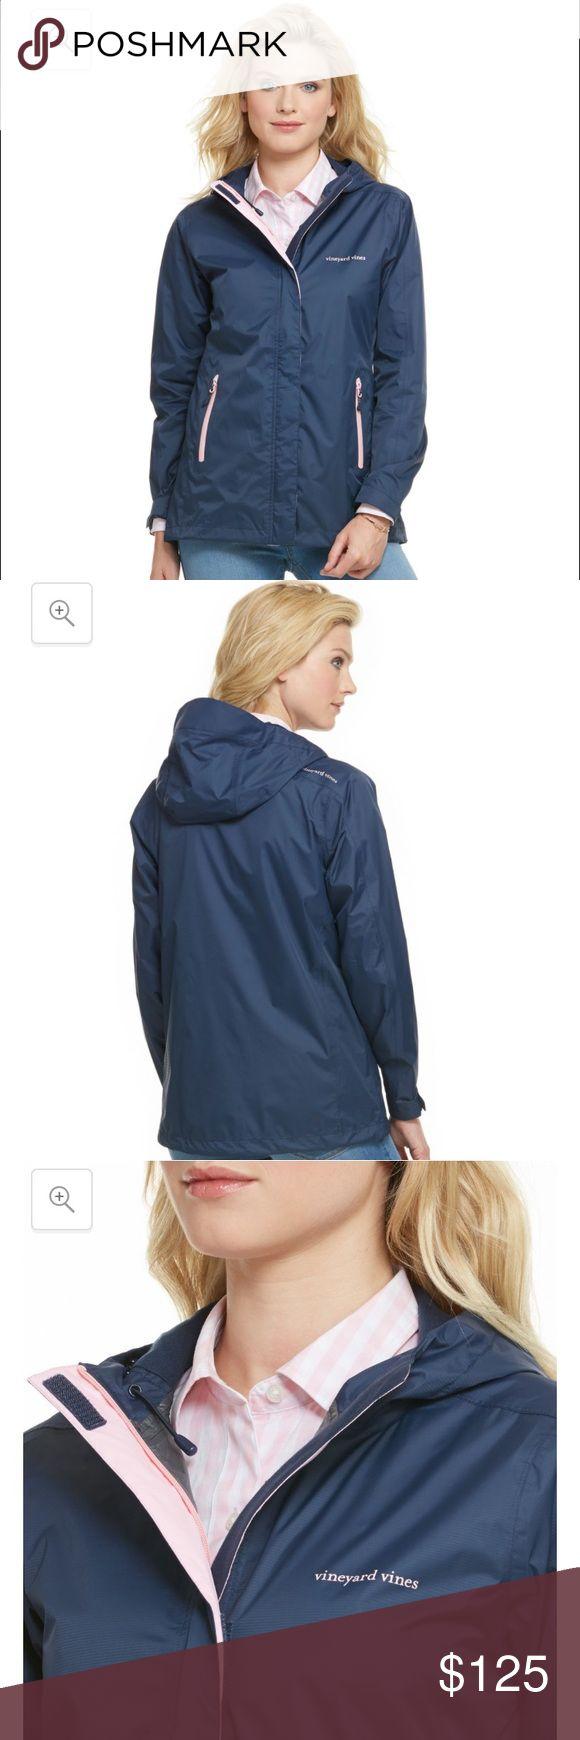 Vineyard vines women's rain coat Brand new without tags Vineyard Vines Jackets & Coats